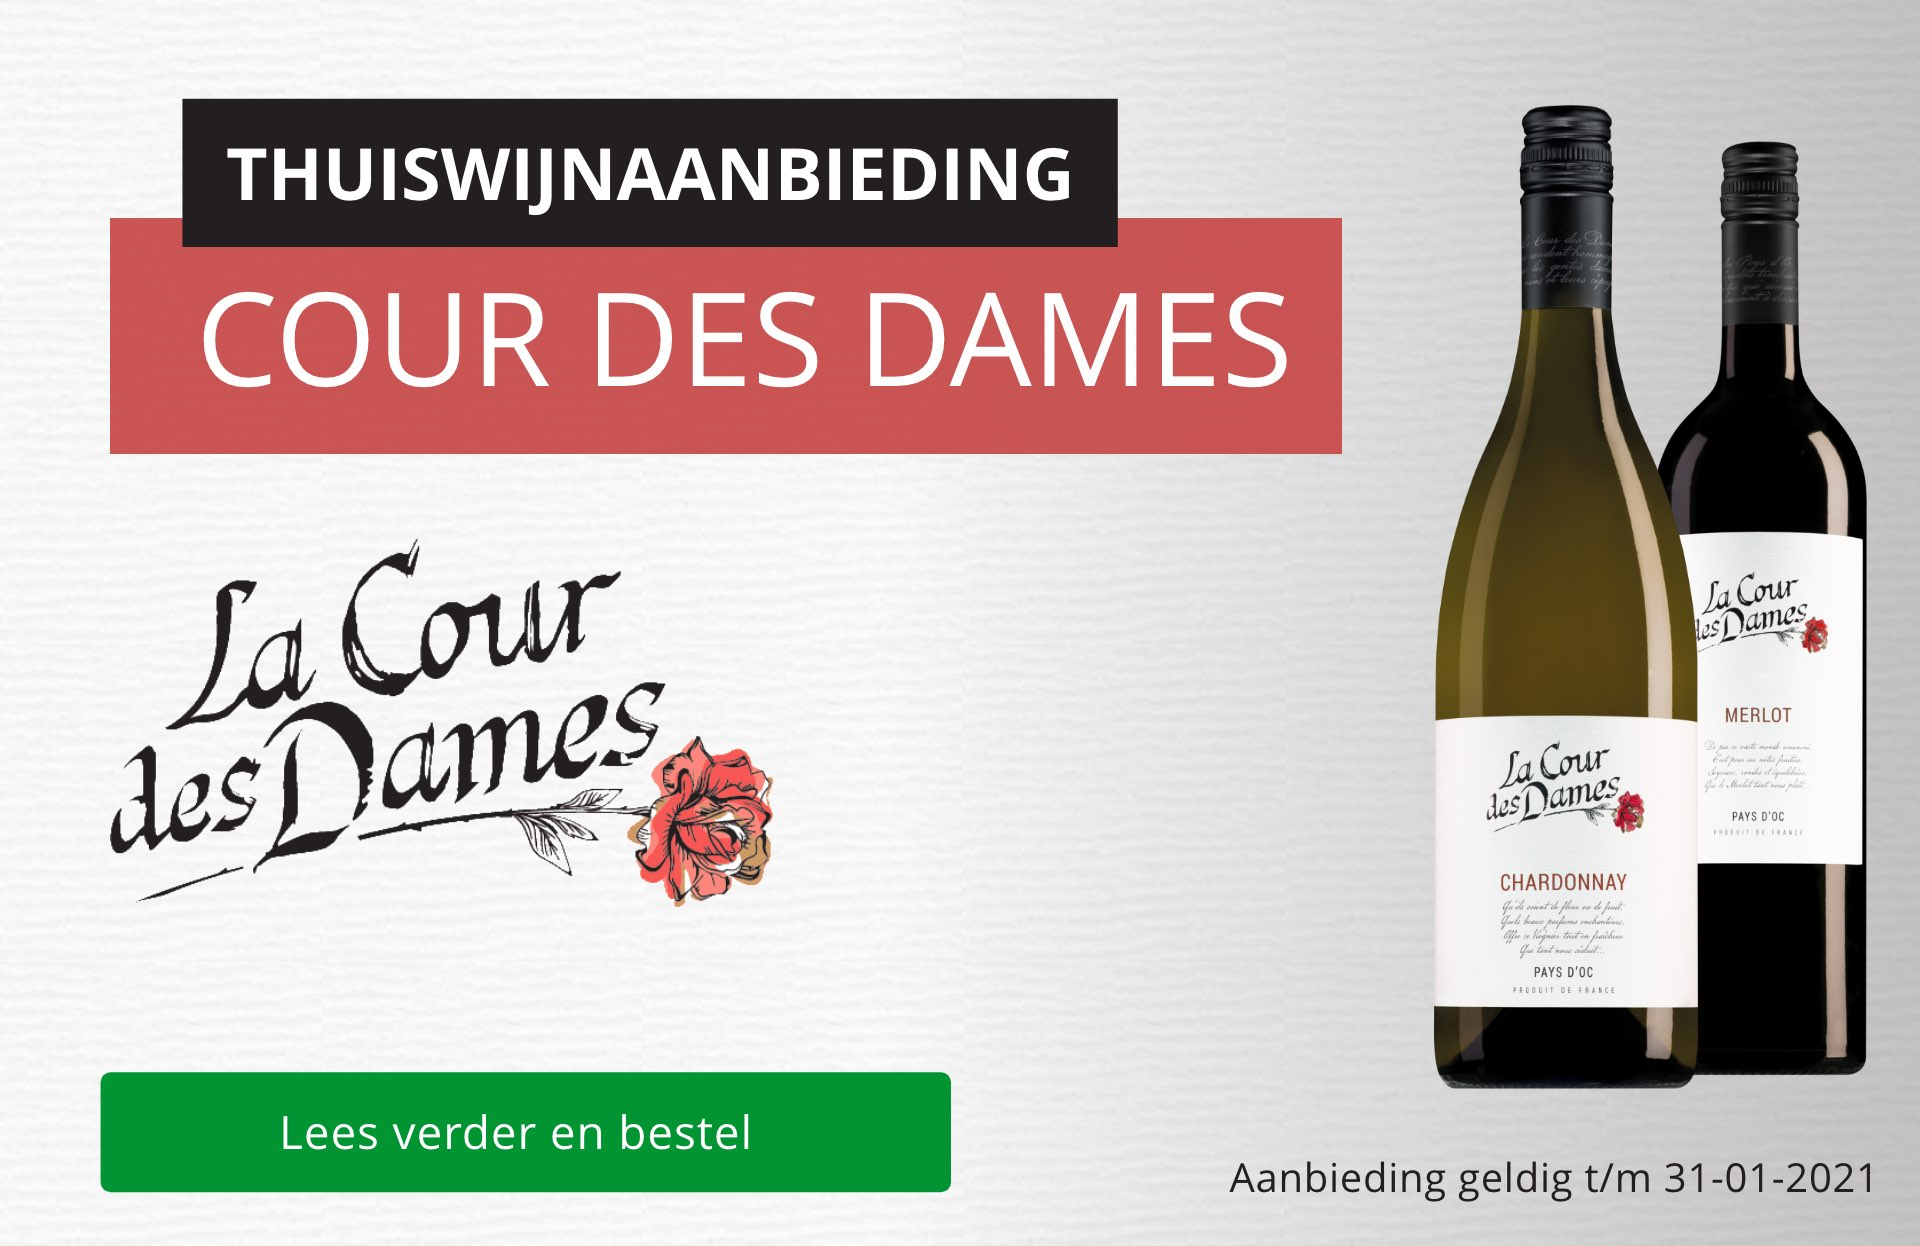 Thuiswijnaanbieding Cour des Dames